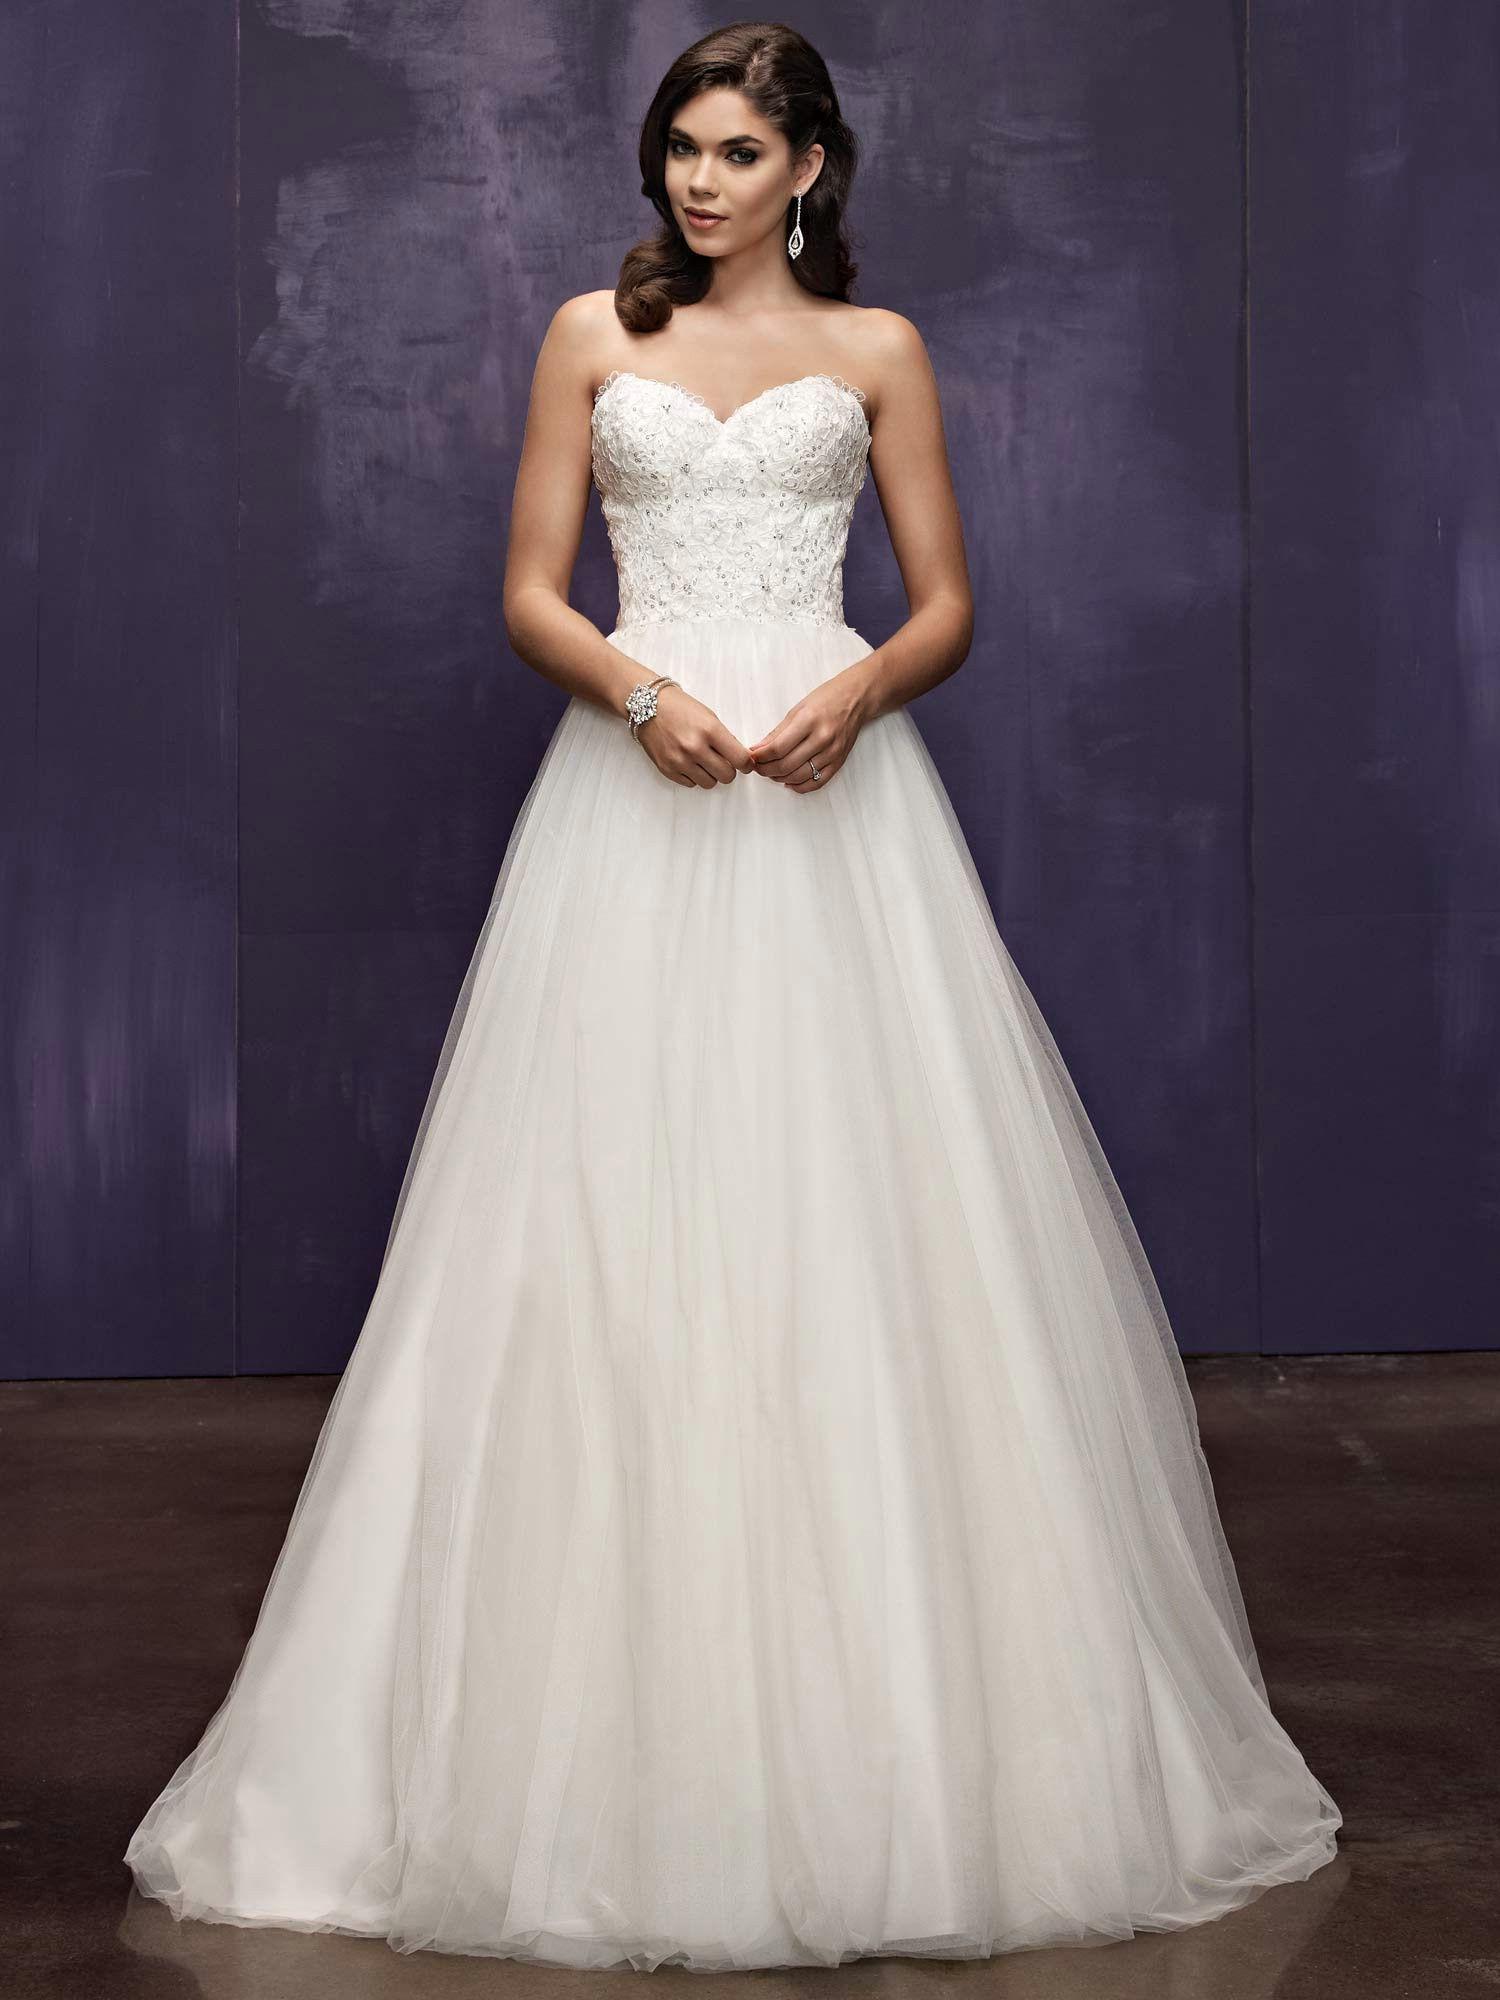 Elegant+Sweetheart+Chapel+Train+Tulle+A+Line+Wedding+Gown